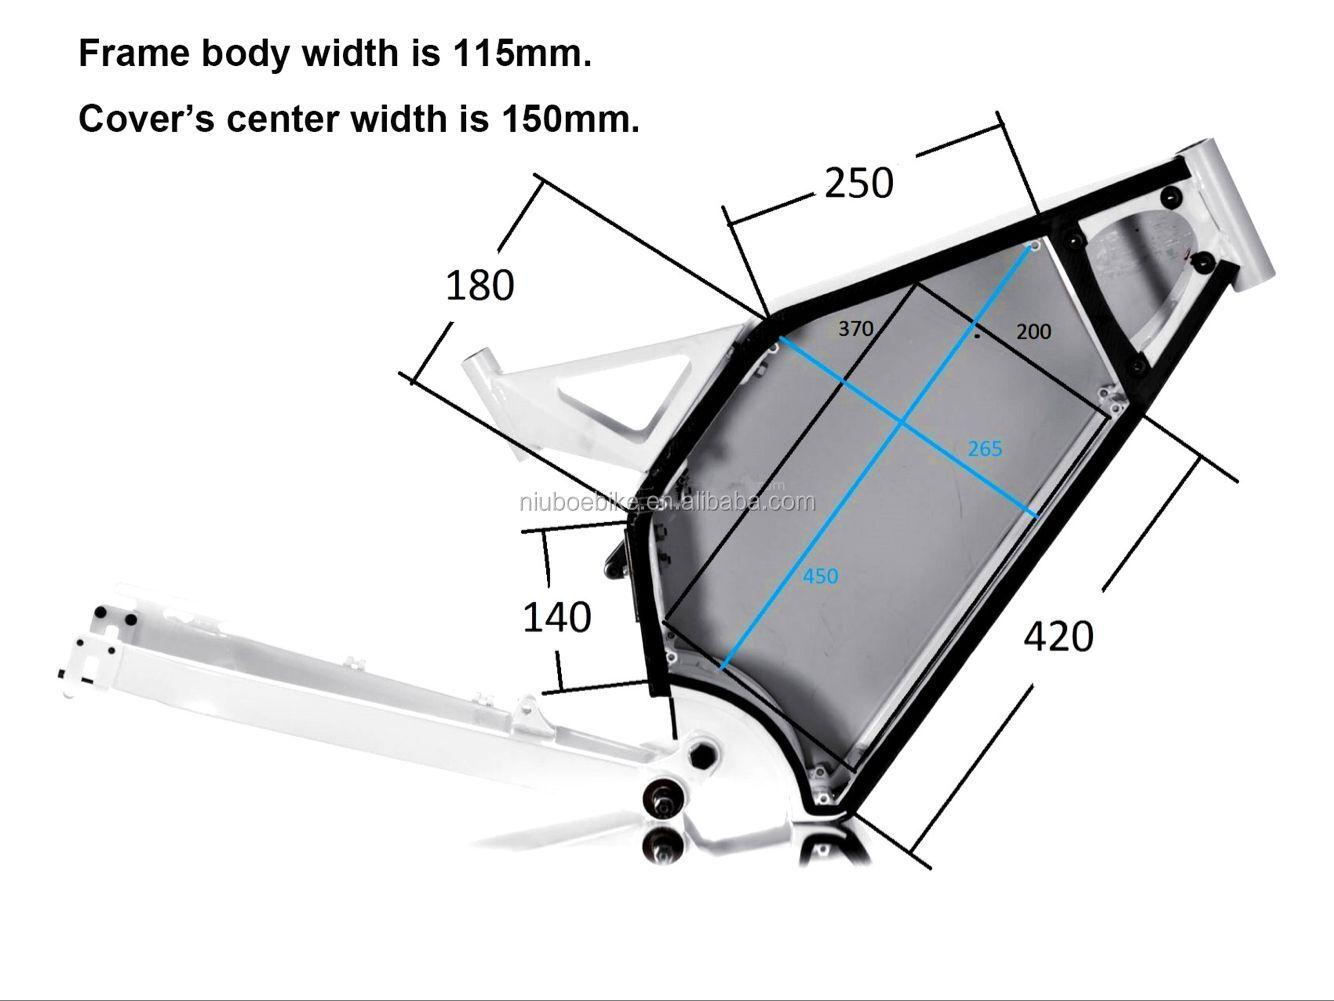 NBpower 72V38.4Ah 18650 литиевая батарея внутри для 3000W 5000W 8000W Enduro Bomber Electric Bike Frame